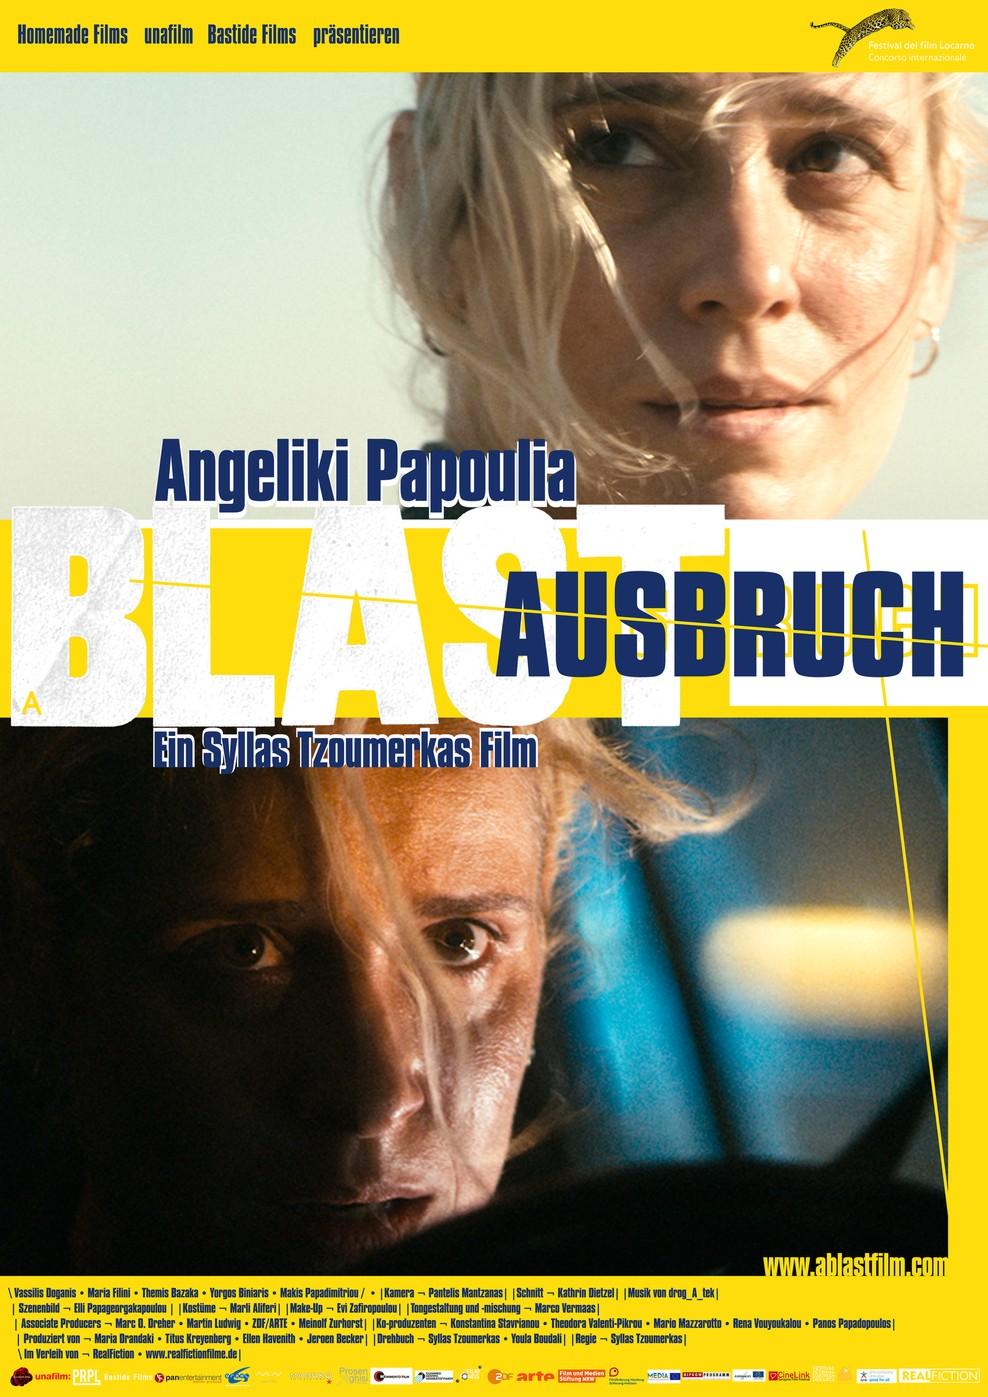 A Blast - Ausbruch (Poster)